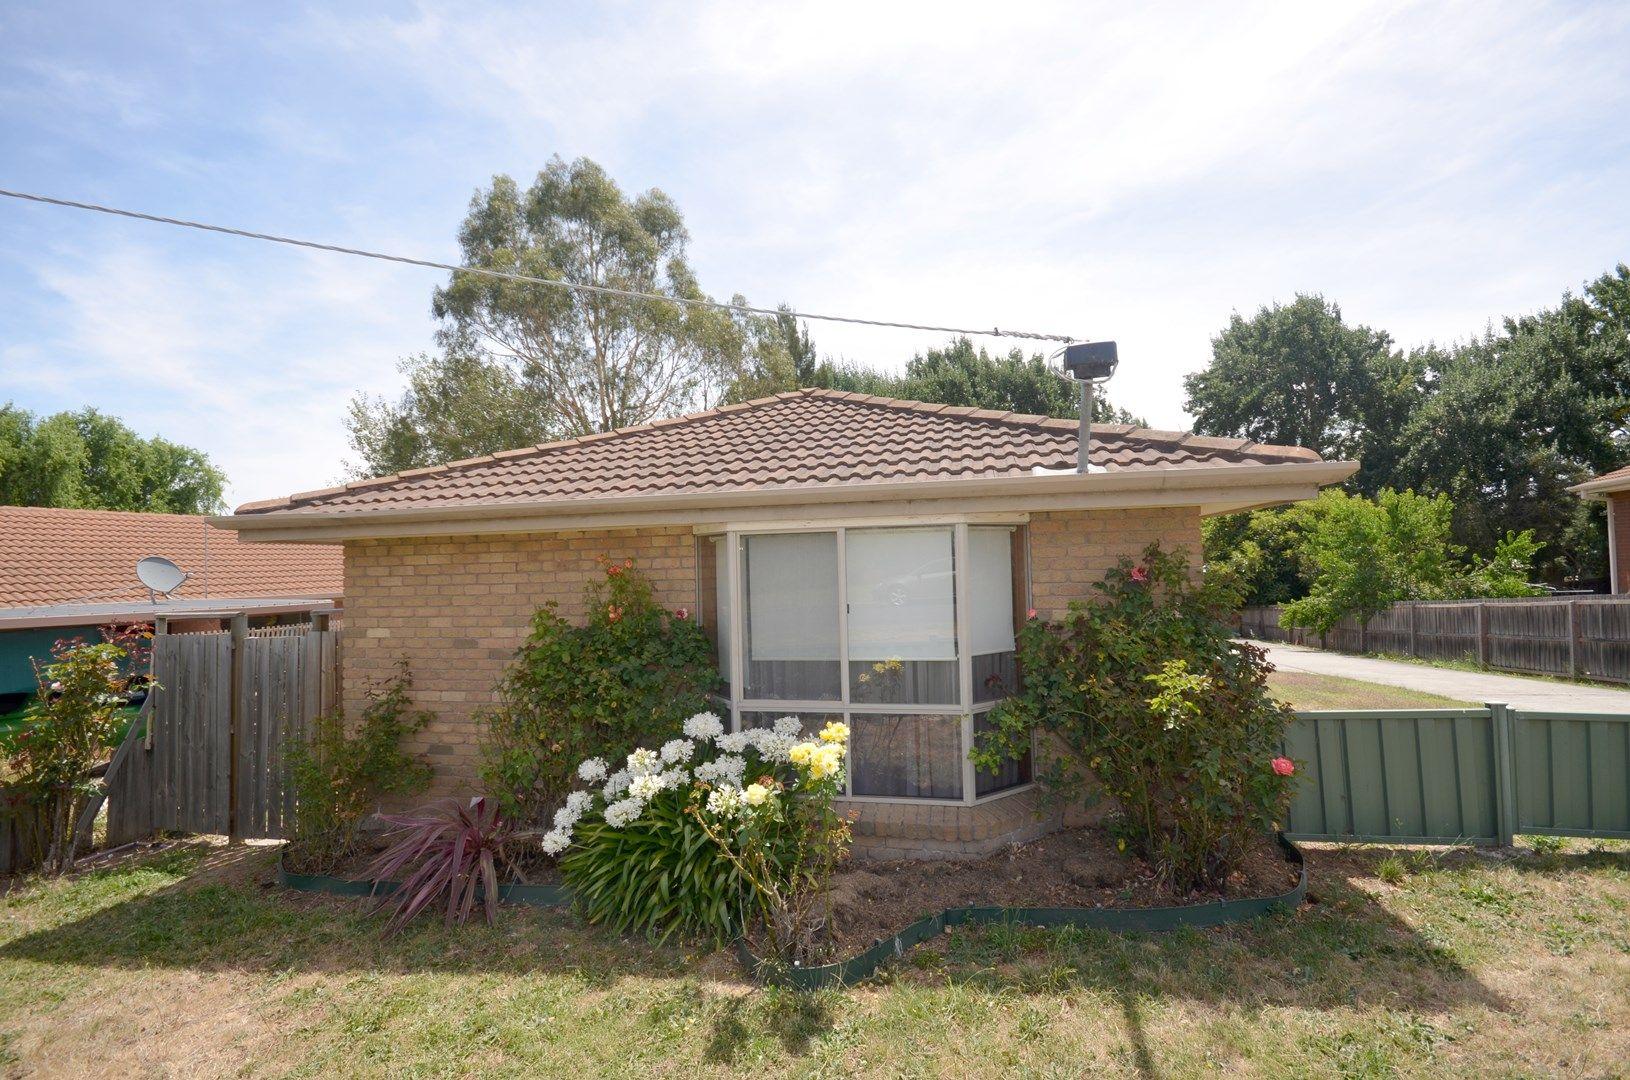 1/204 Larter Street, Ballarat East VIC 3350, Image 0